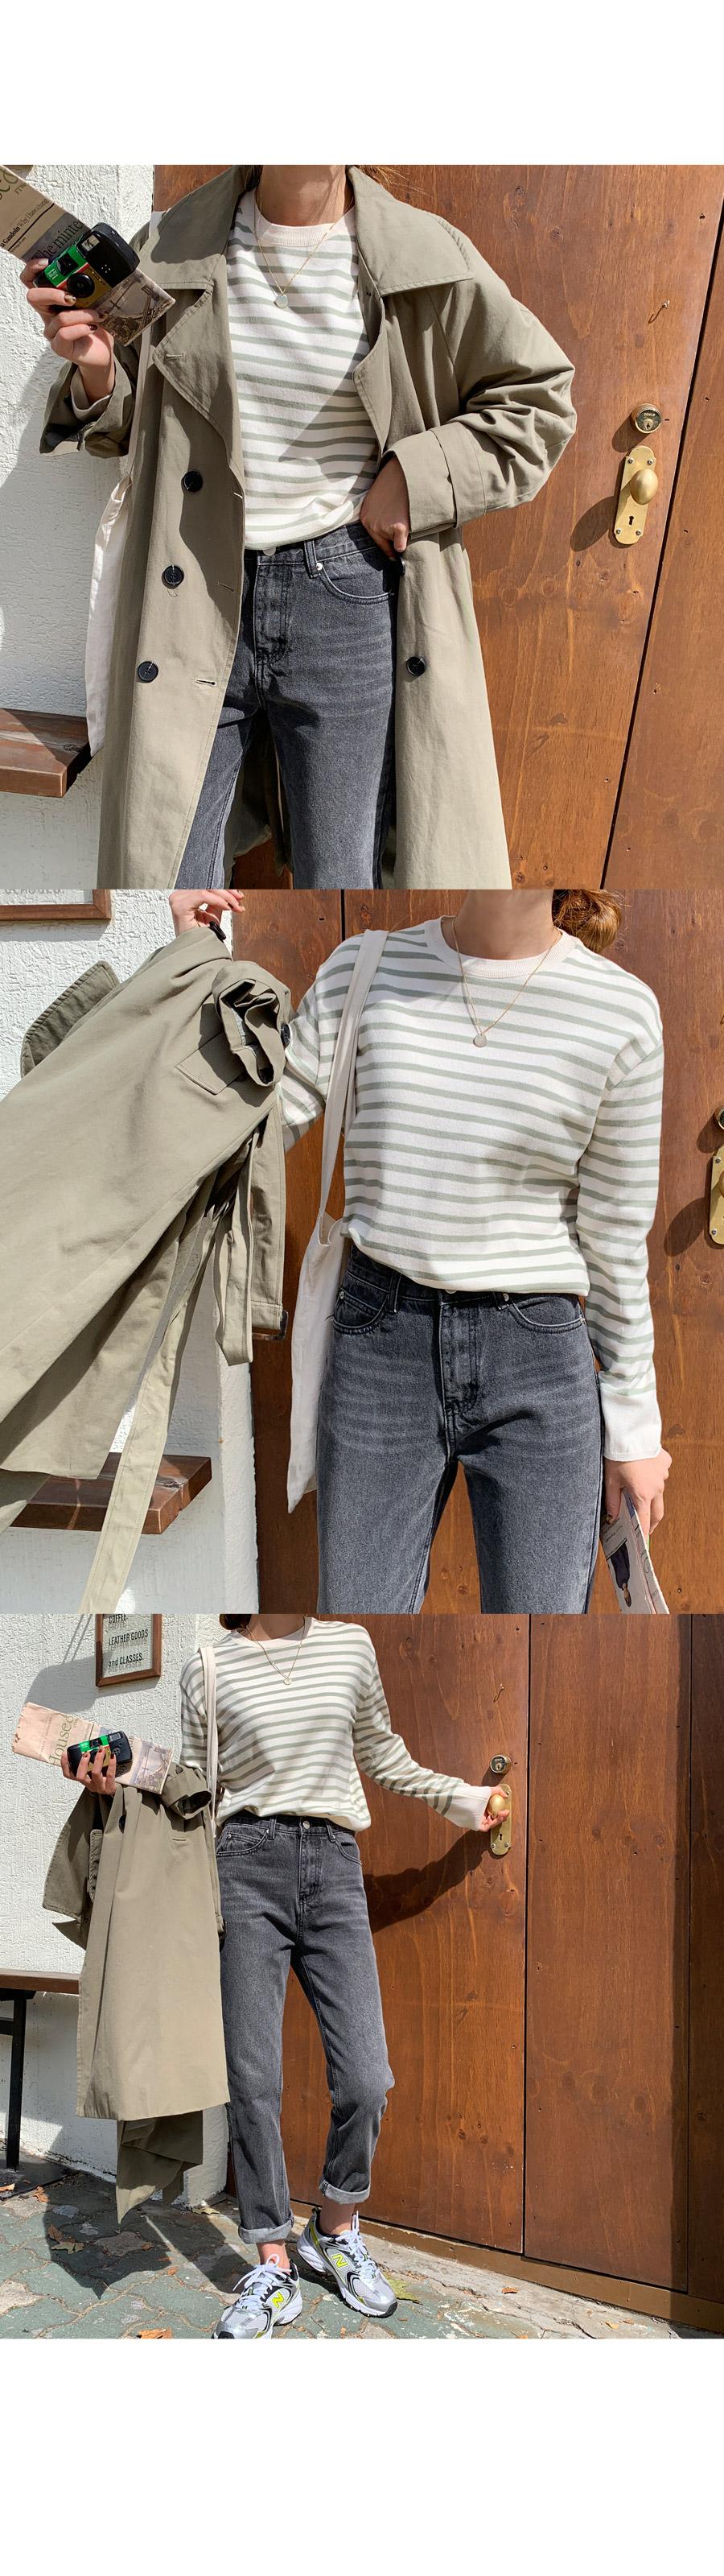 Carry Soft Basic Dangara Knit